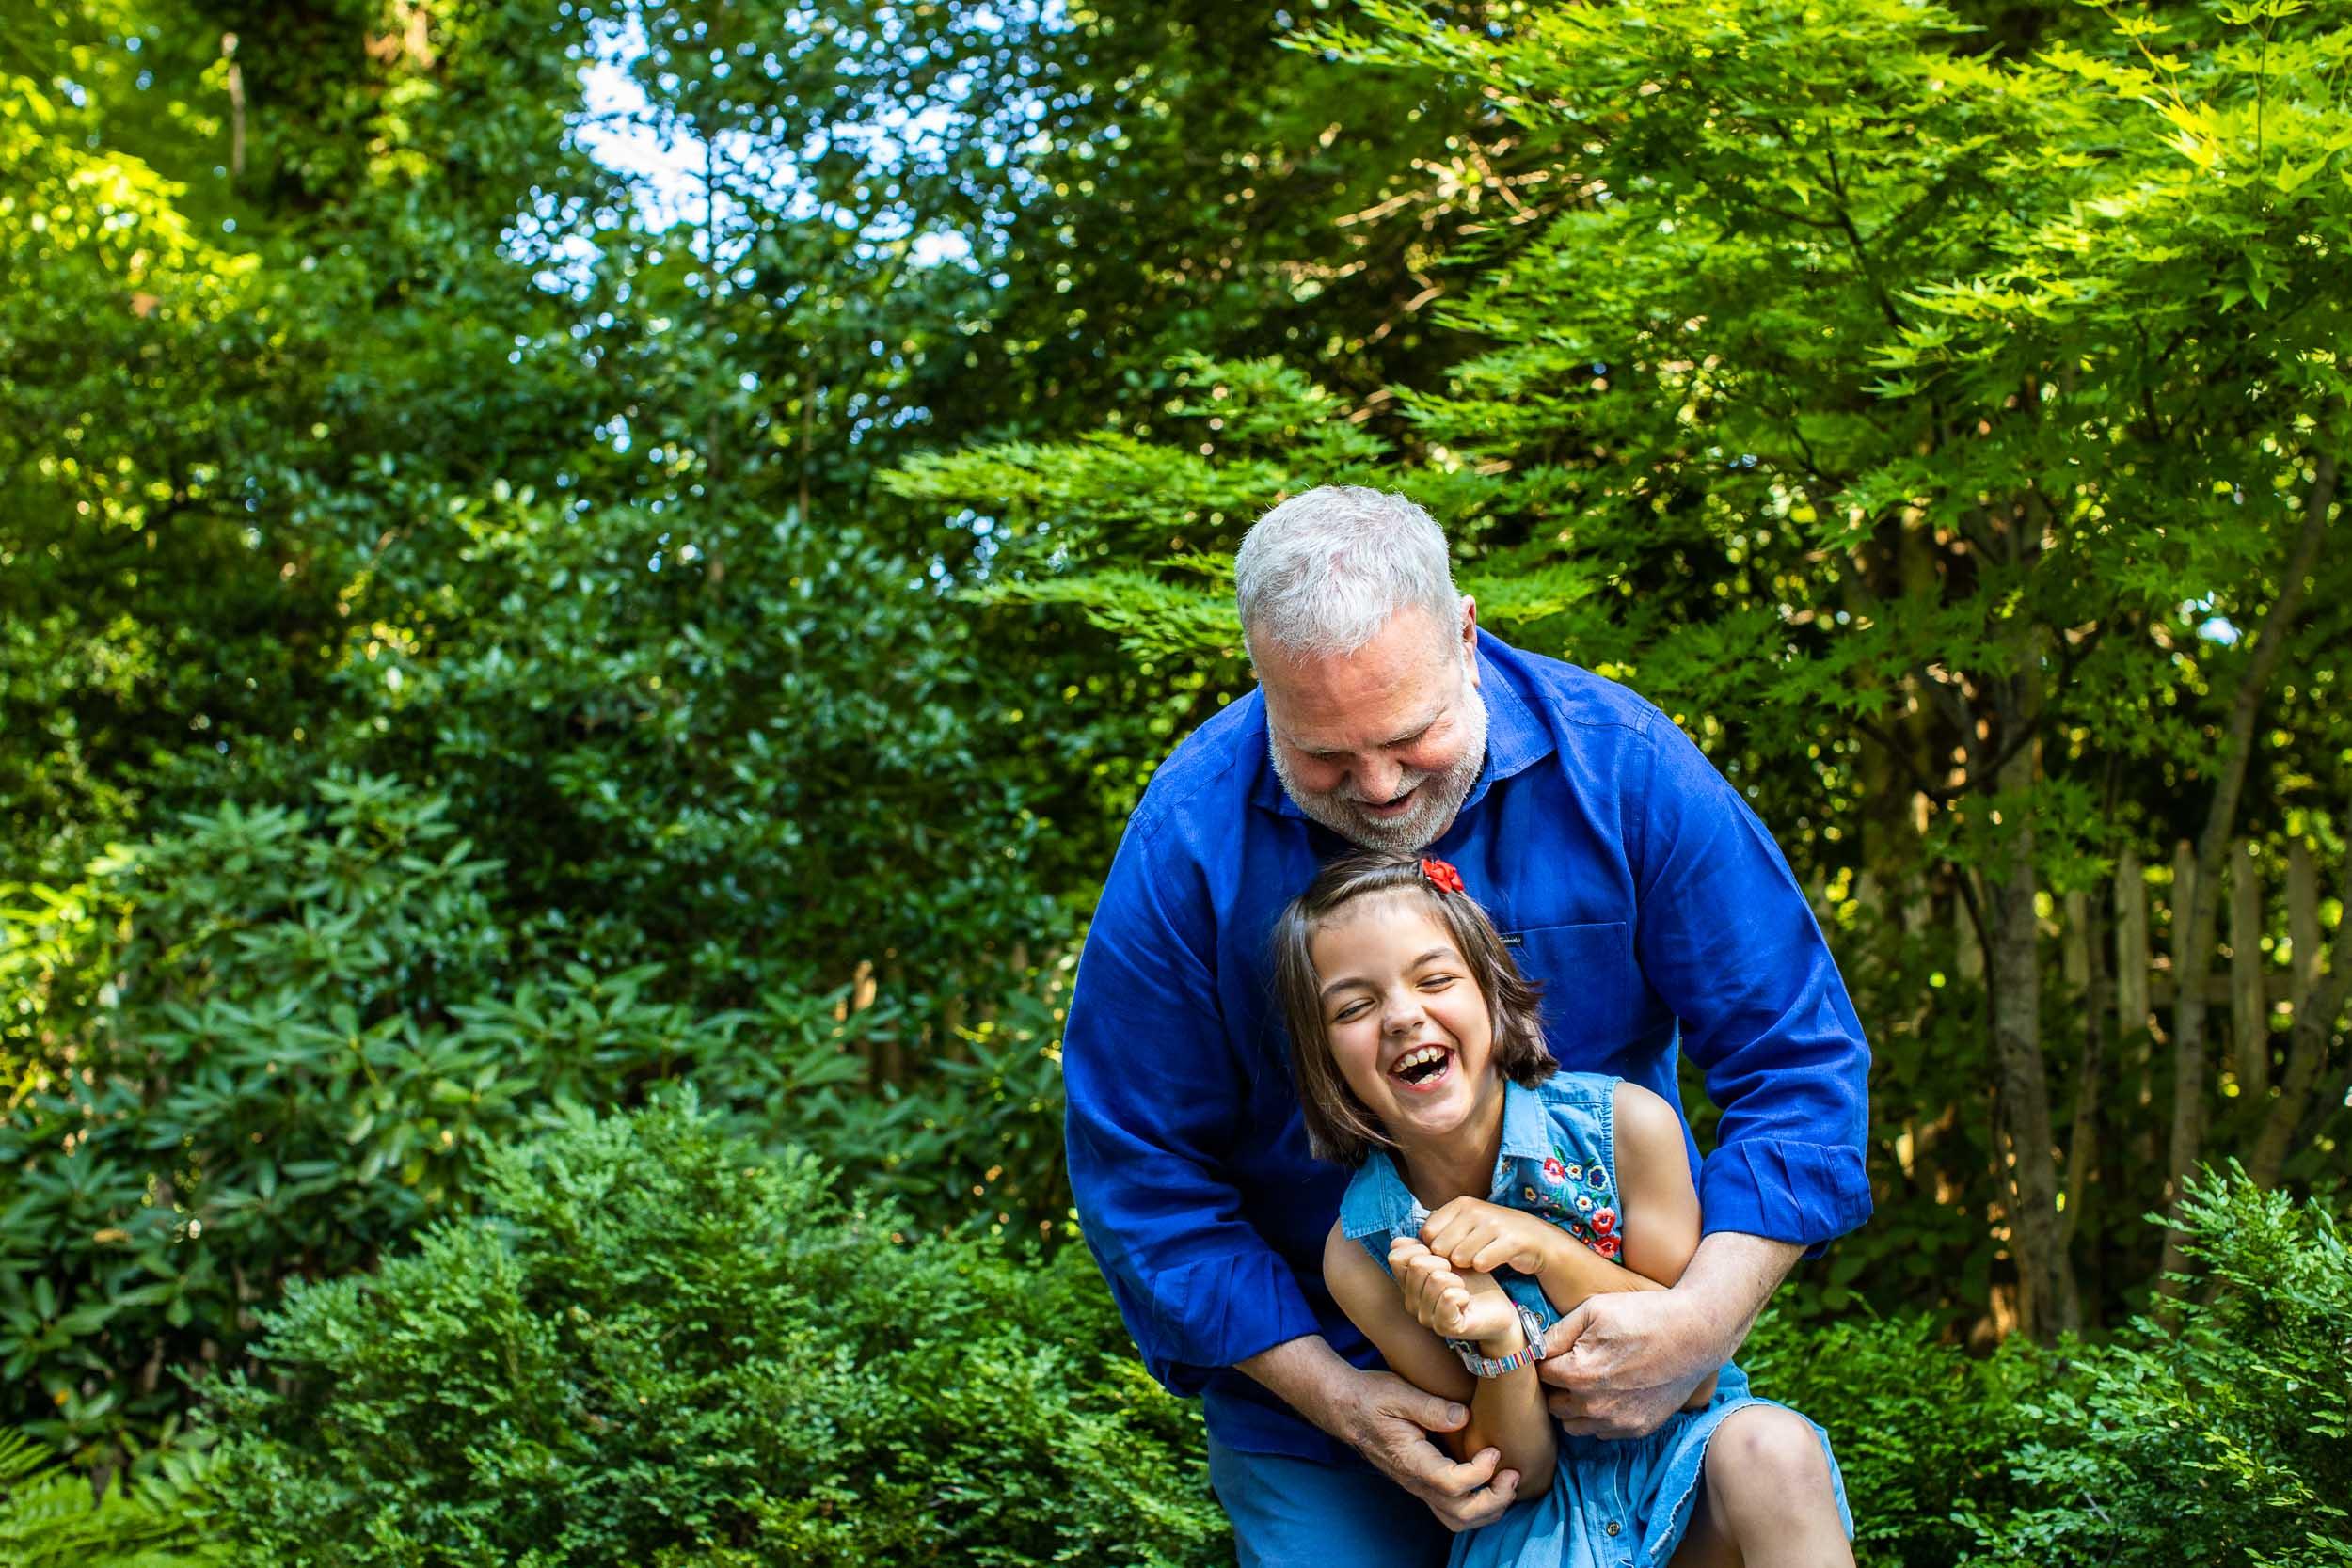 Chevy Chase MD Backyard Family Portraits Maryland Photography Tara Parekh Photography -08.jpg